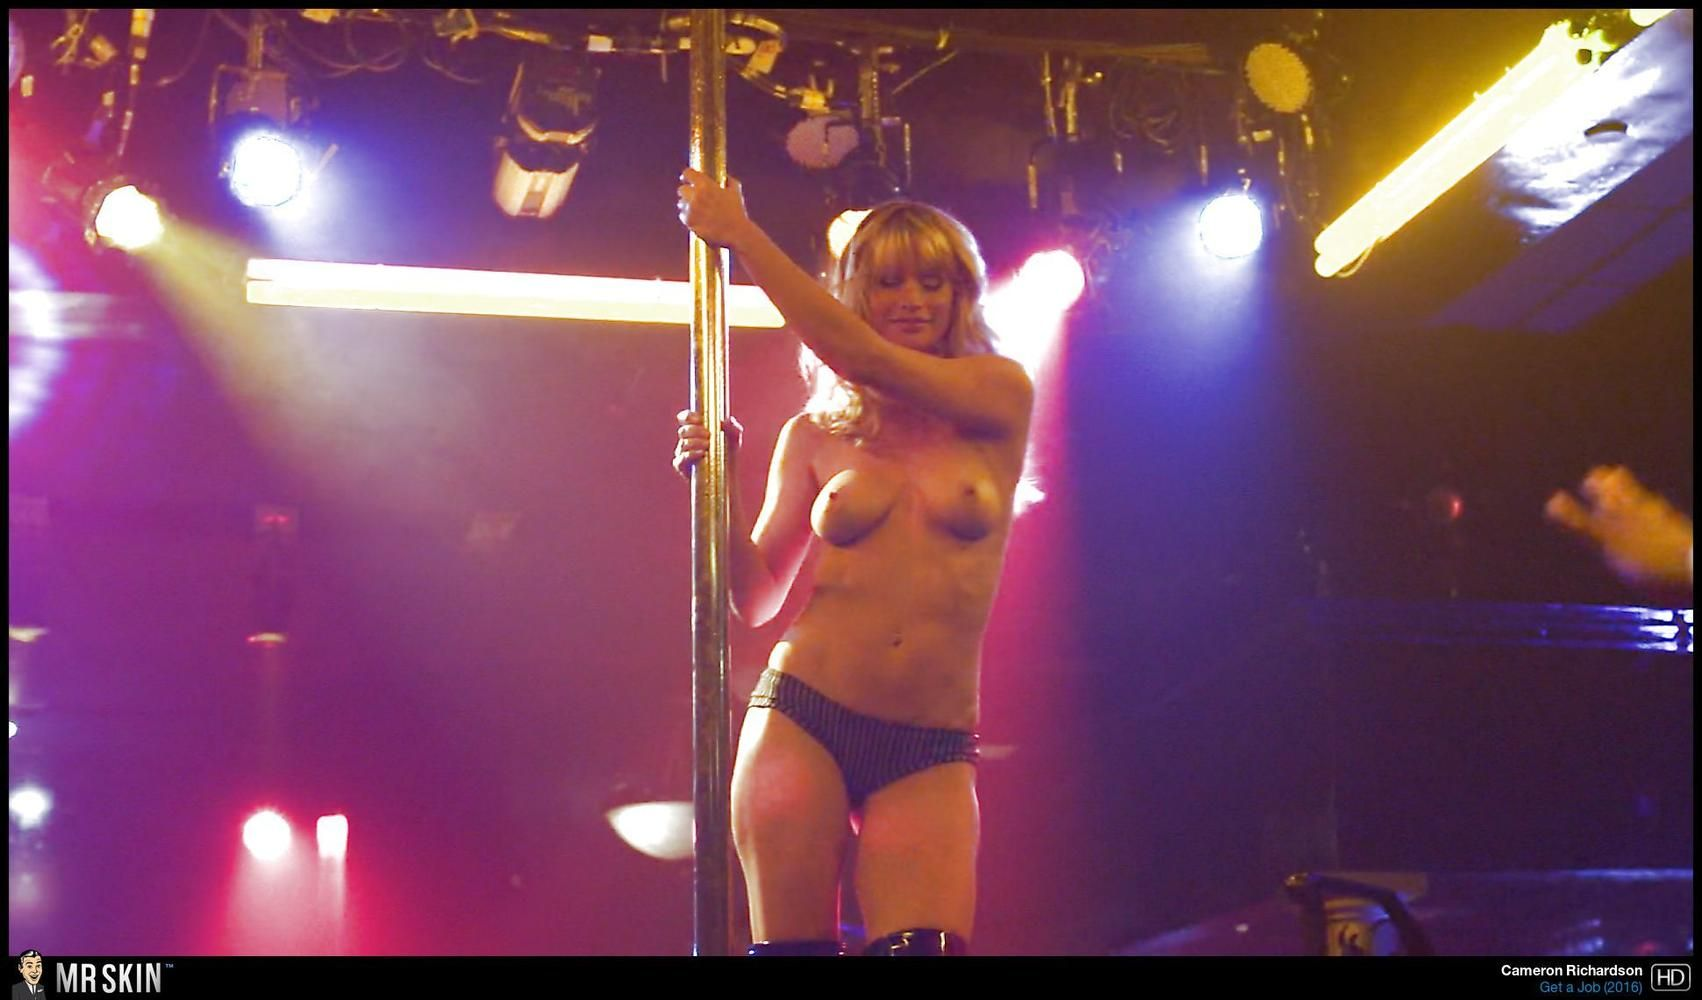 Hot Britney Spears Naked Bathroom Gif